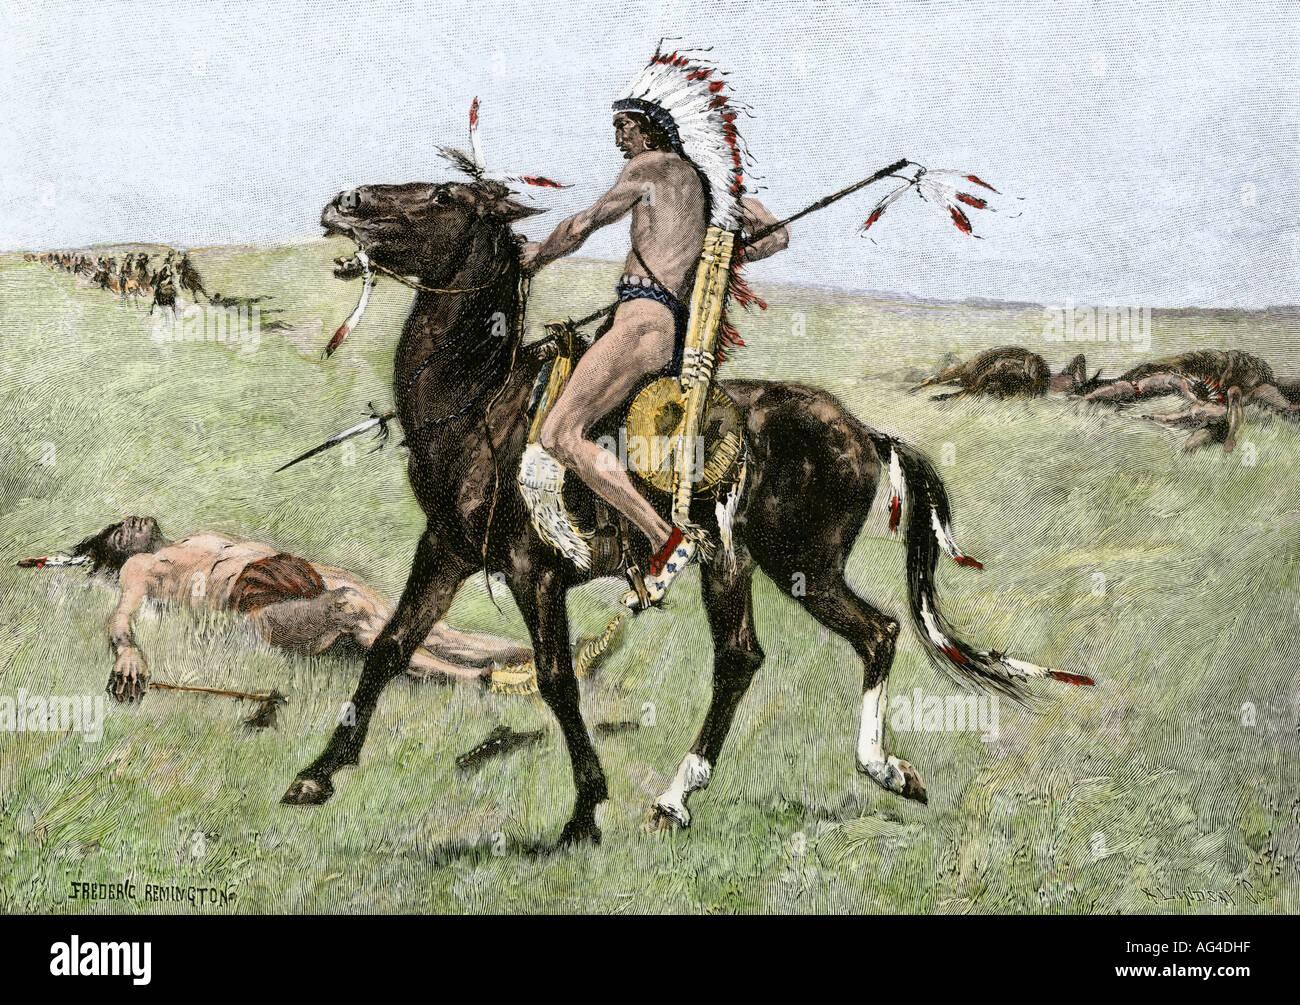 warrior native plain american - photo #21